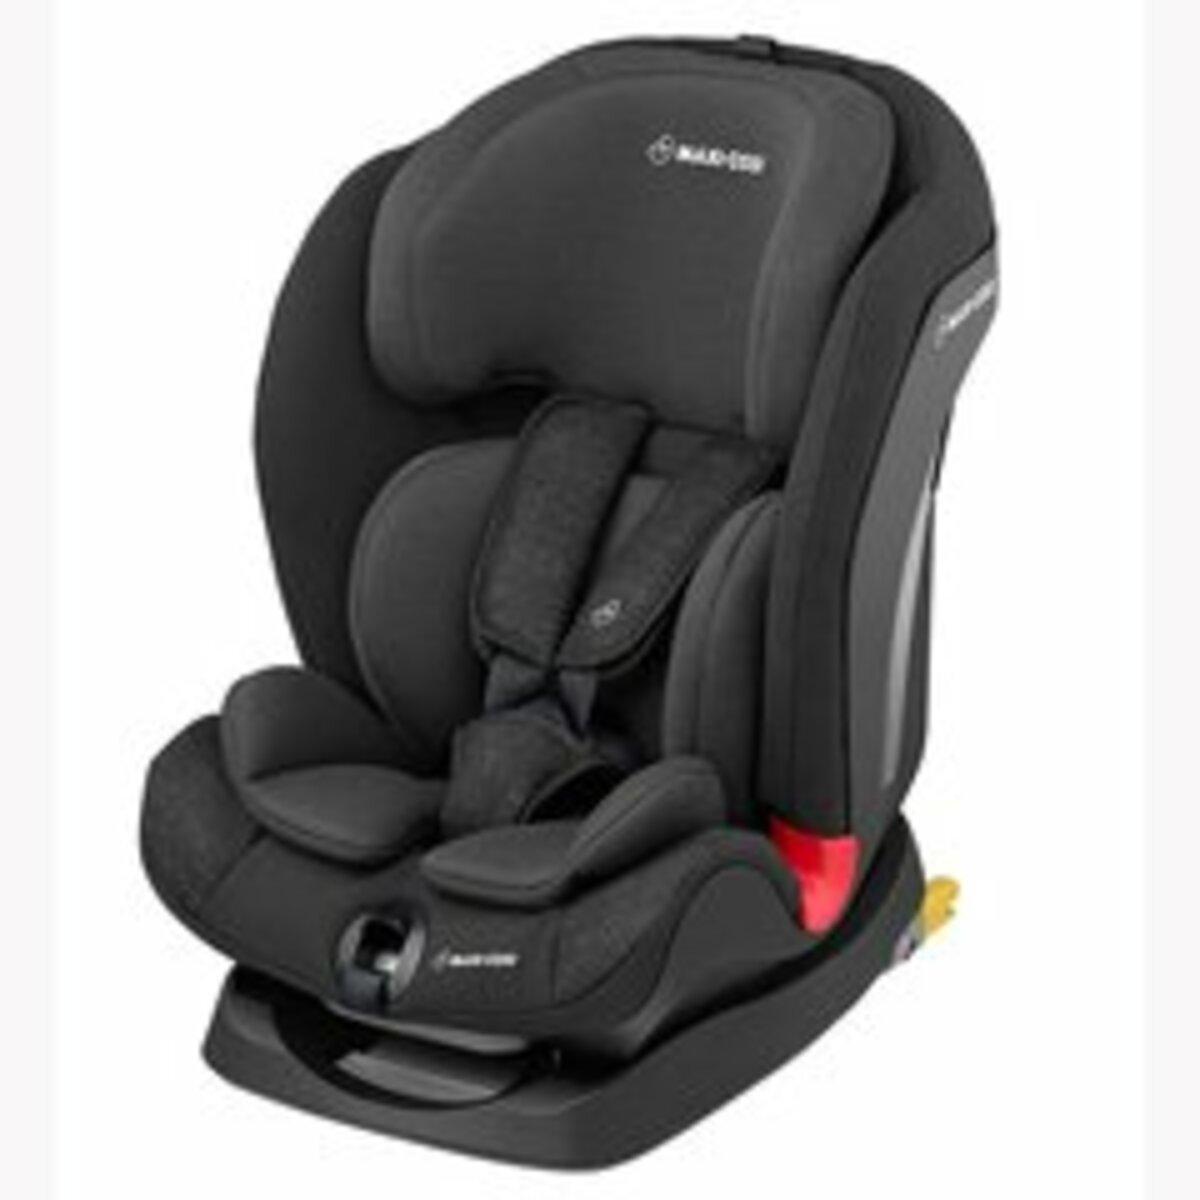 Bild 4 von Maxi-Cosi - Kindersitz Titan, Nomad Black